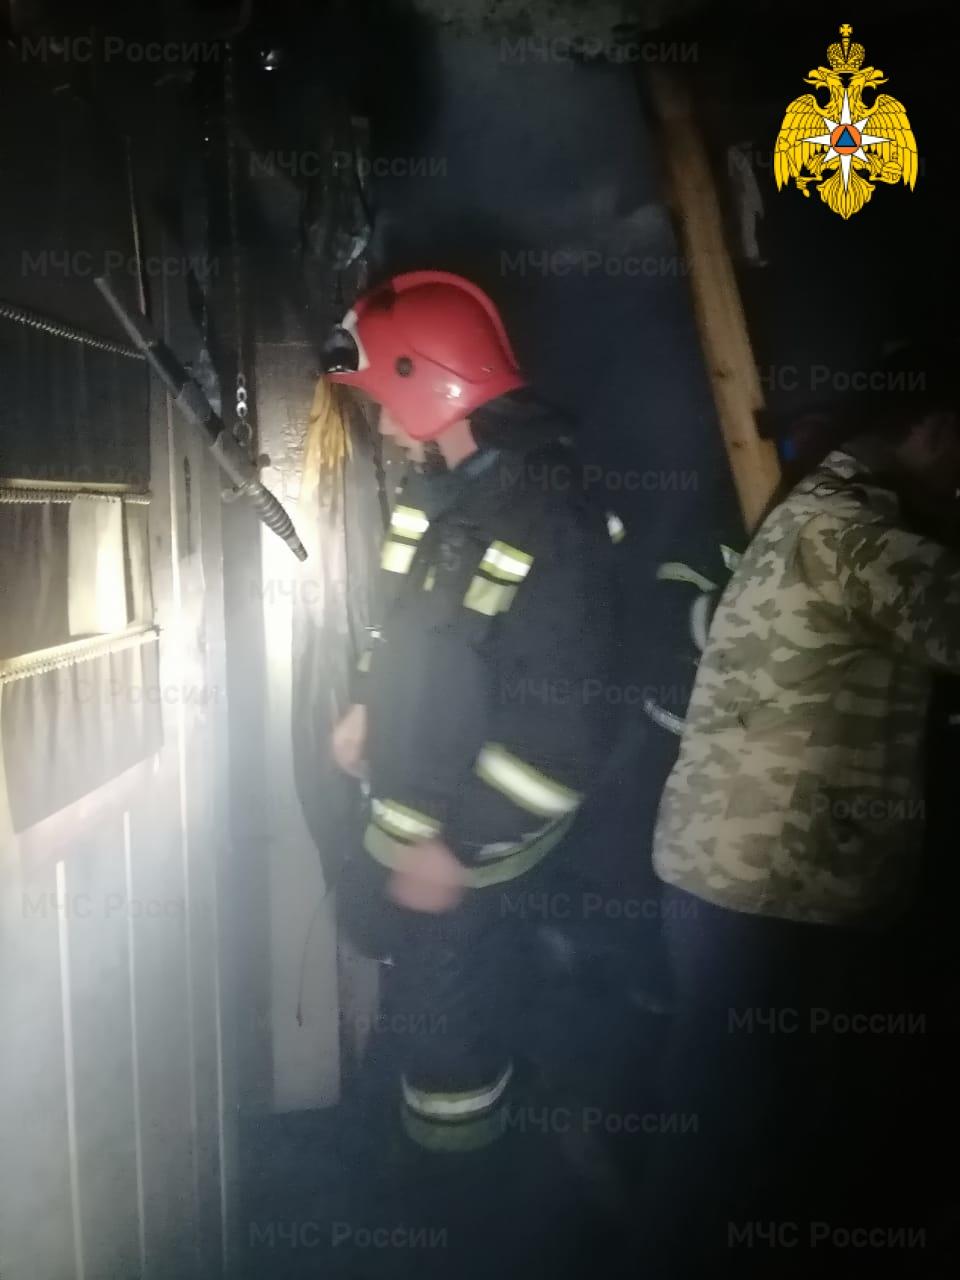 Пожар в Тарусском районе, с. Петрищево, ул. Центральная